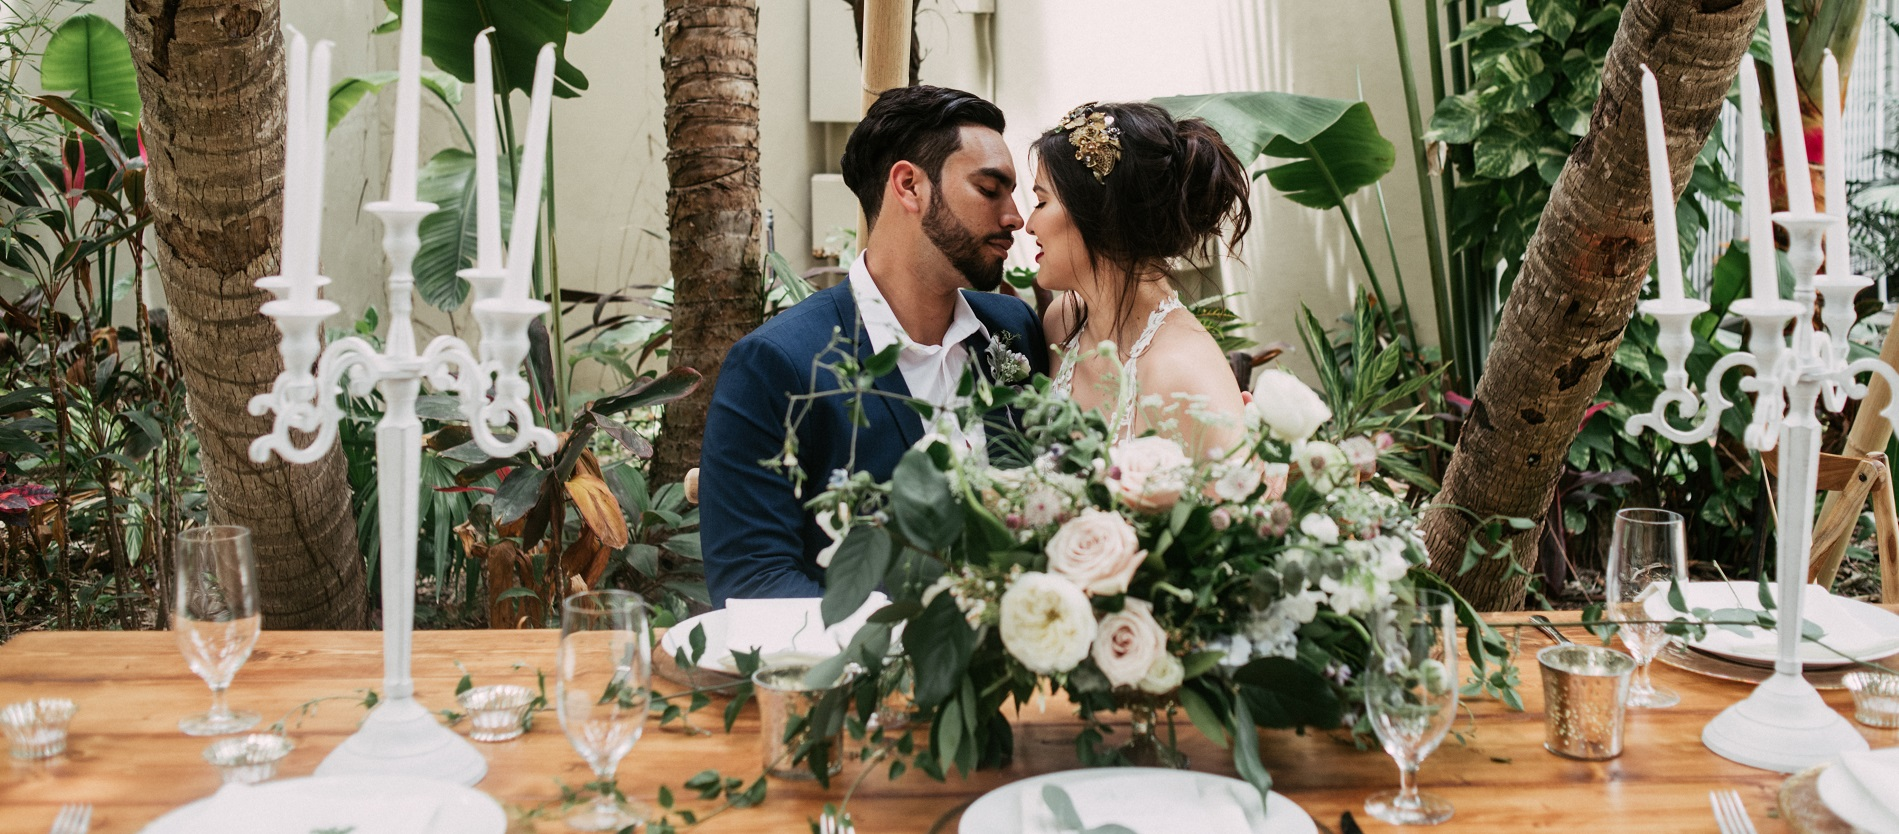 wedding_photographer_miami_sara-lobla_0215